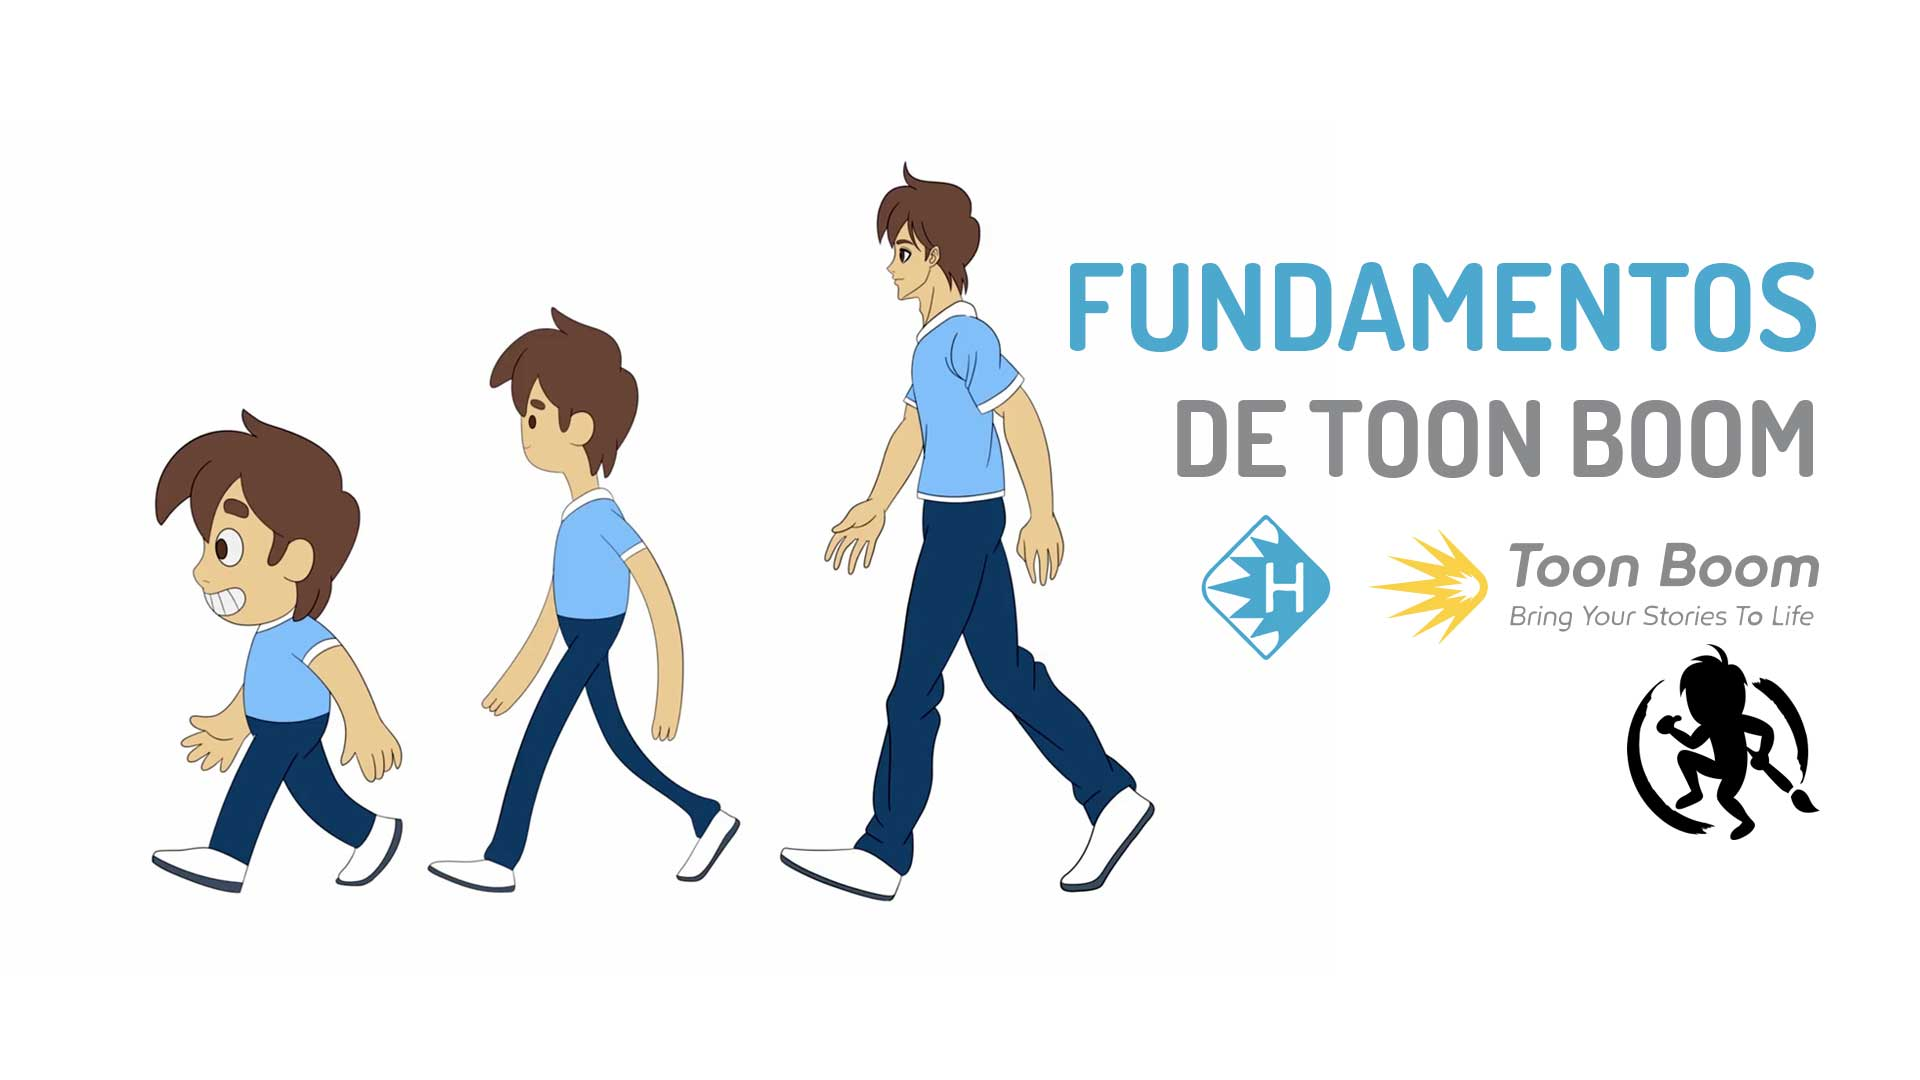 Curso Fundamentos de Toon Boom en Crehana